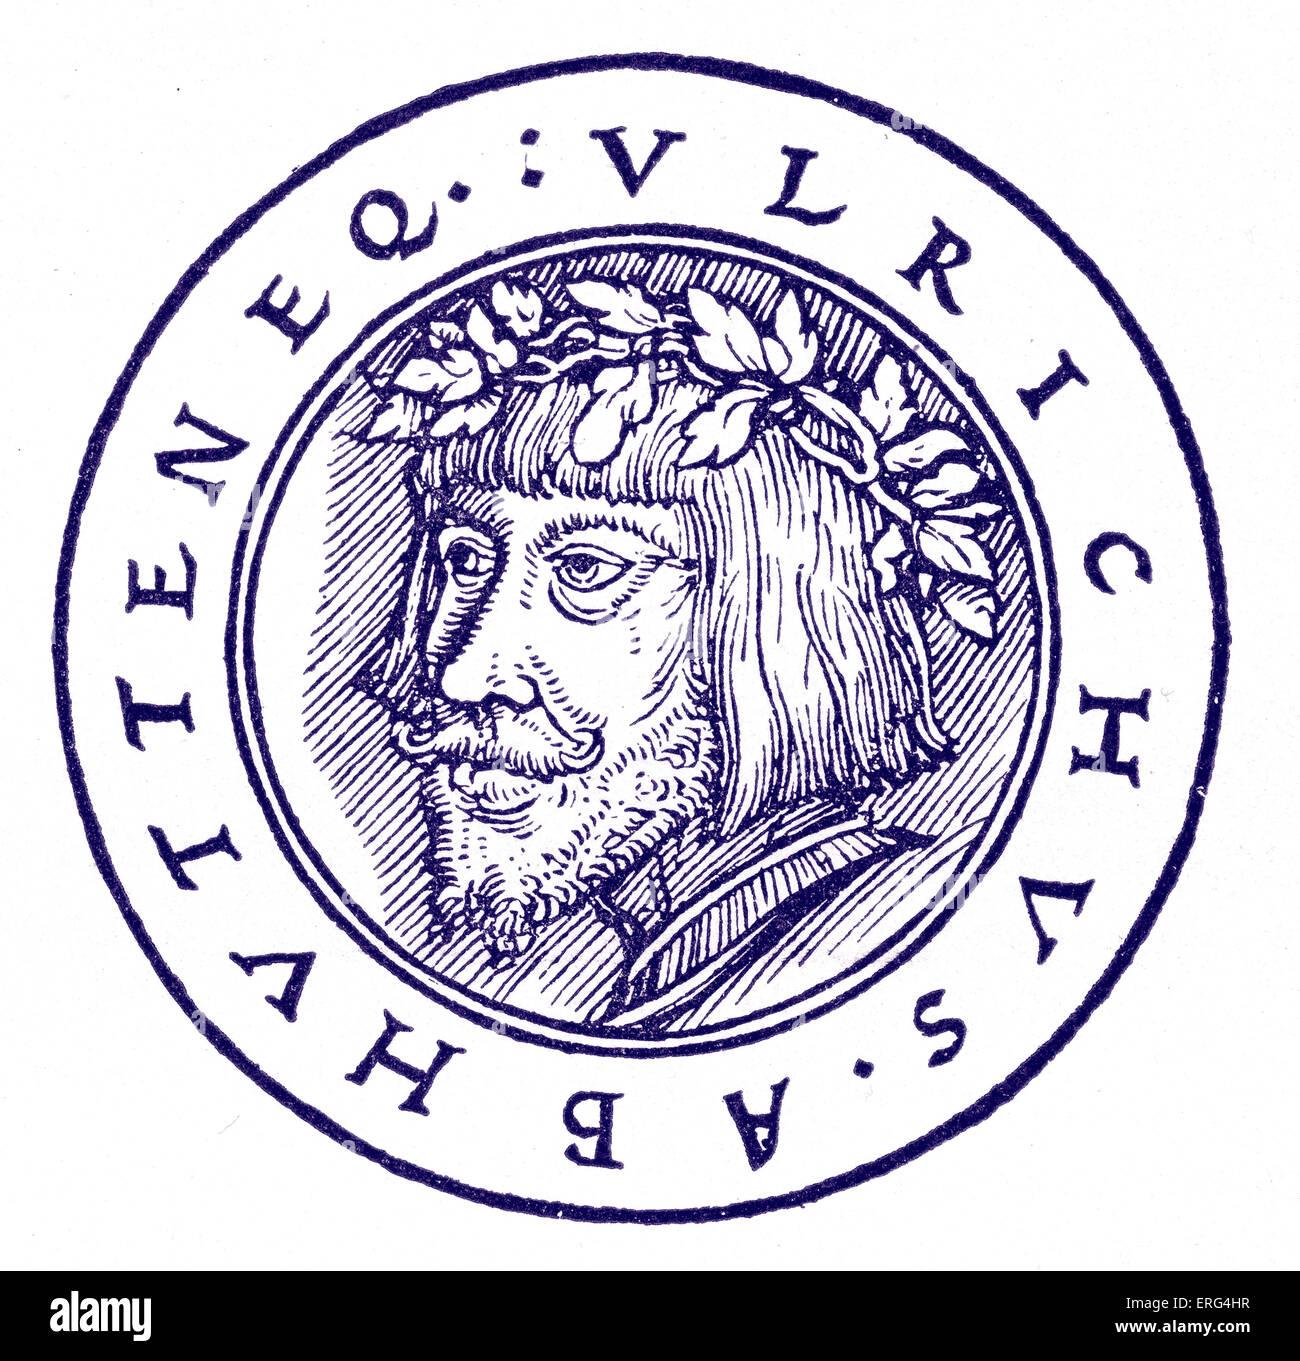 Ulrich von Hutten German Church reformer 21 April 1488 - 29 August 1523.  After a German woodcut dated 1523. - Stock Image